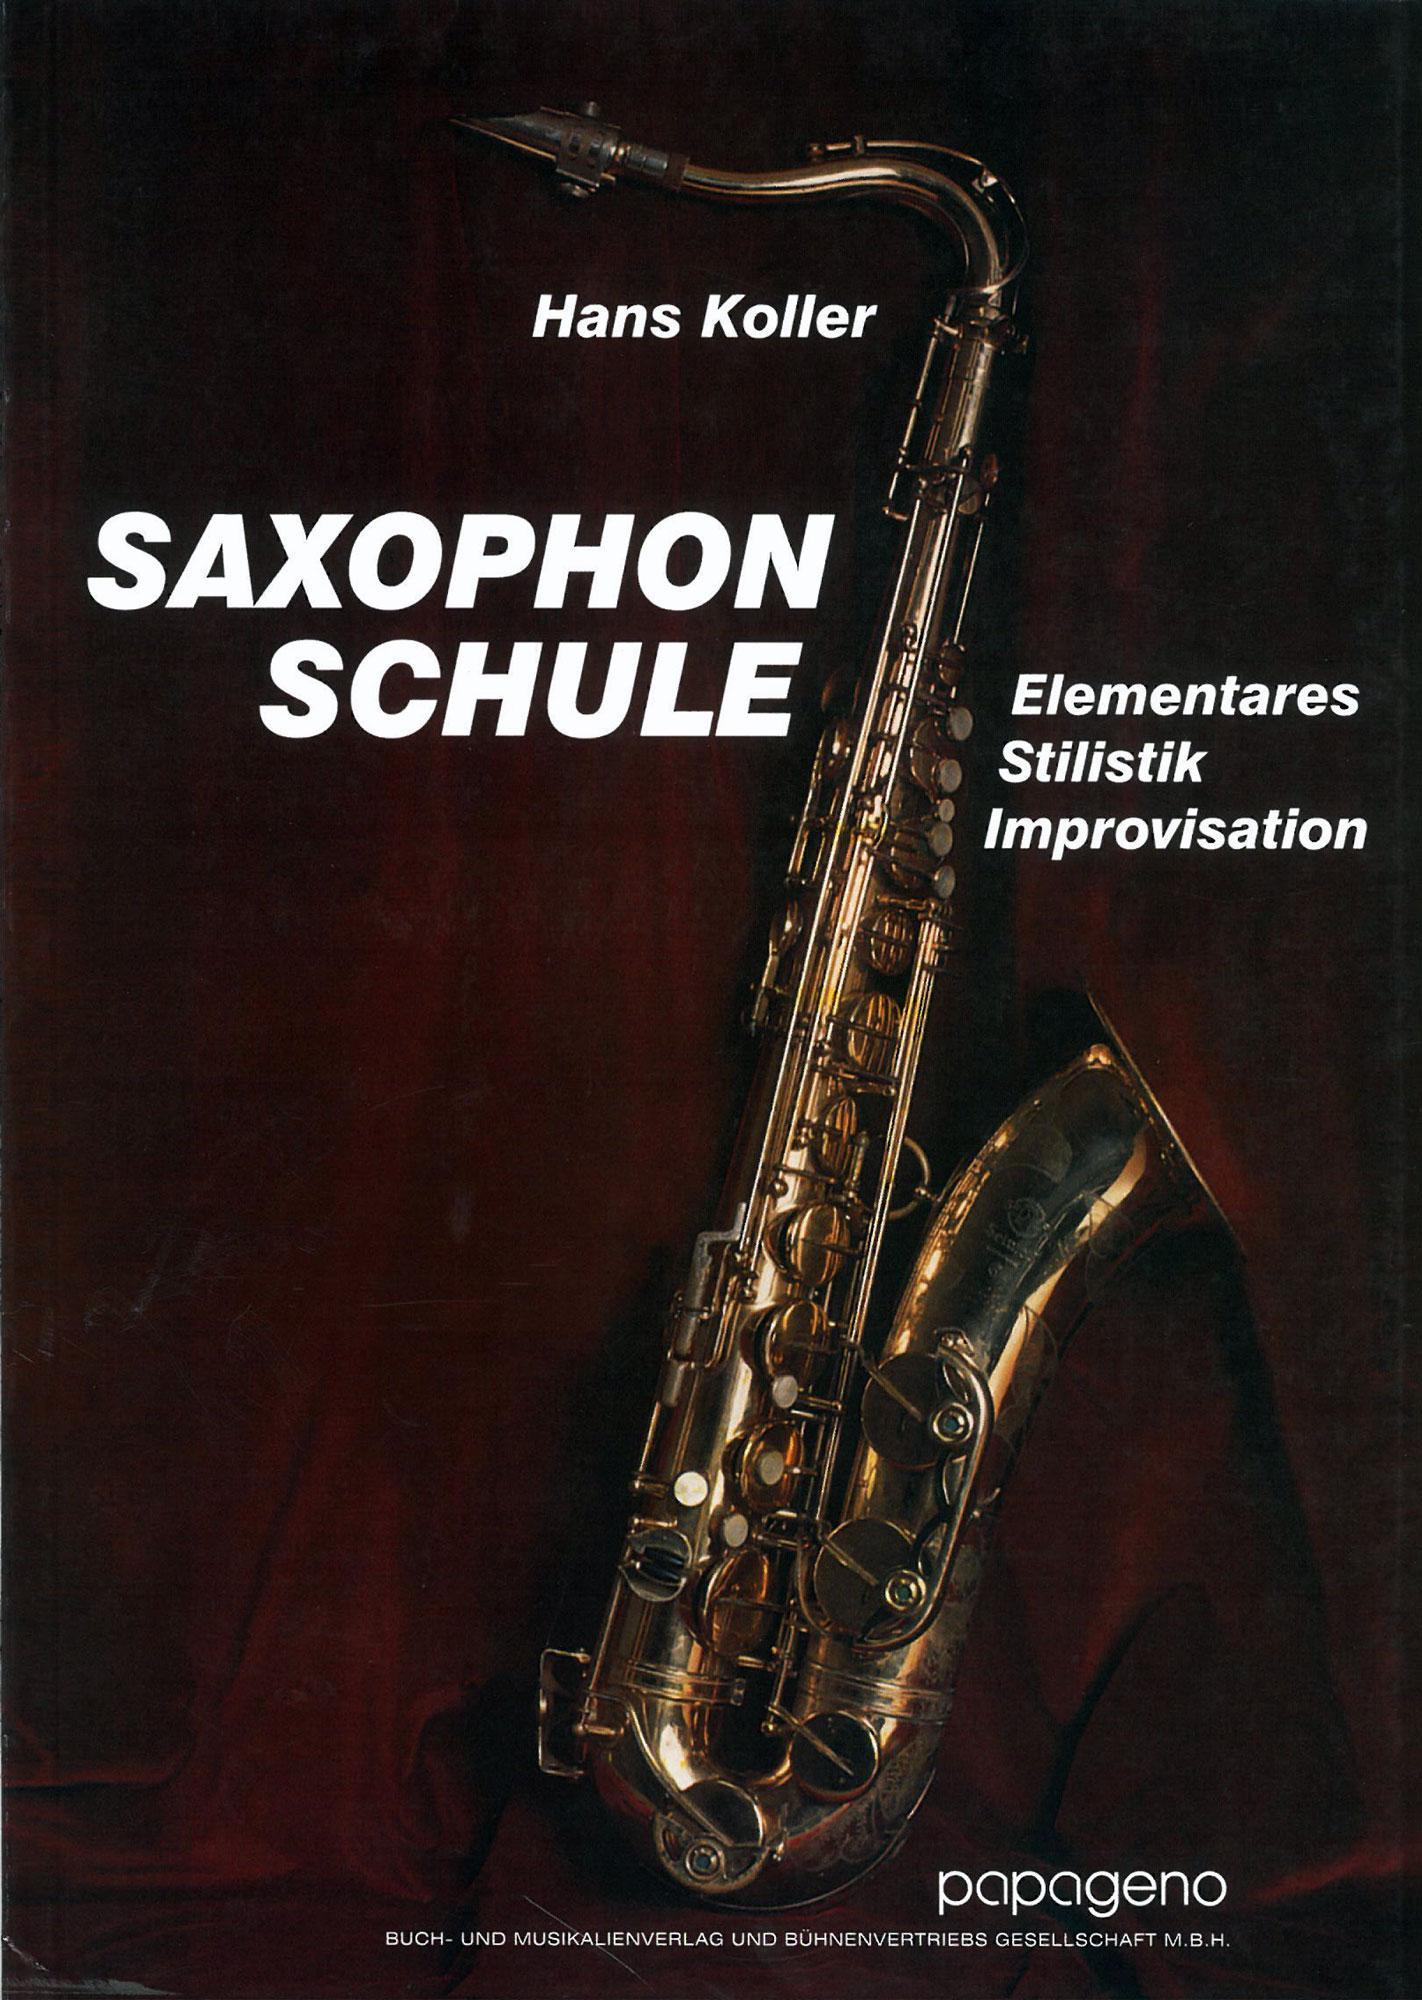 Saxophonlernen - Hans Koller Saxophon Schule - Onlineshop Musikhaus Kirstein